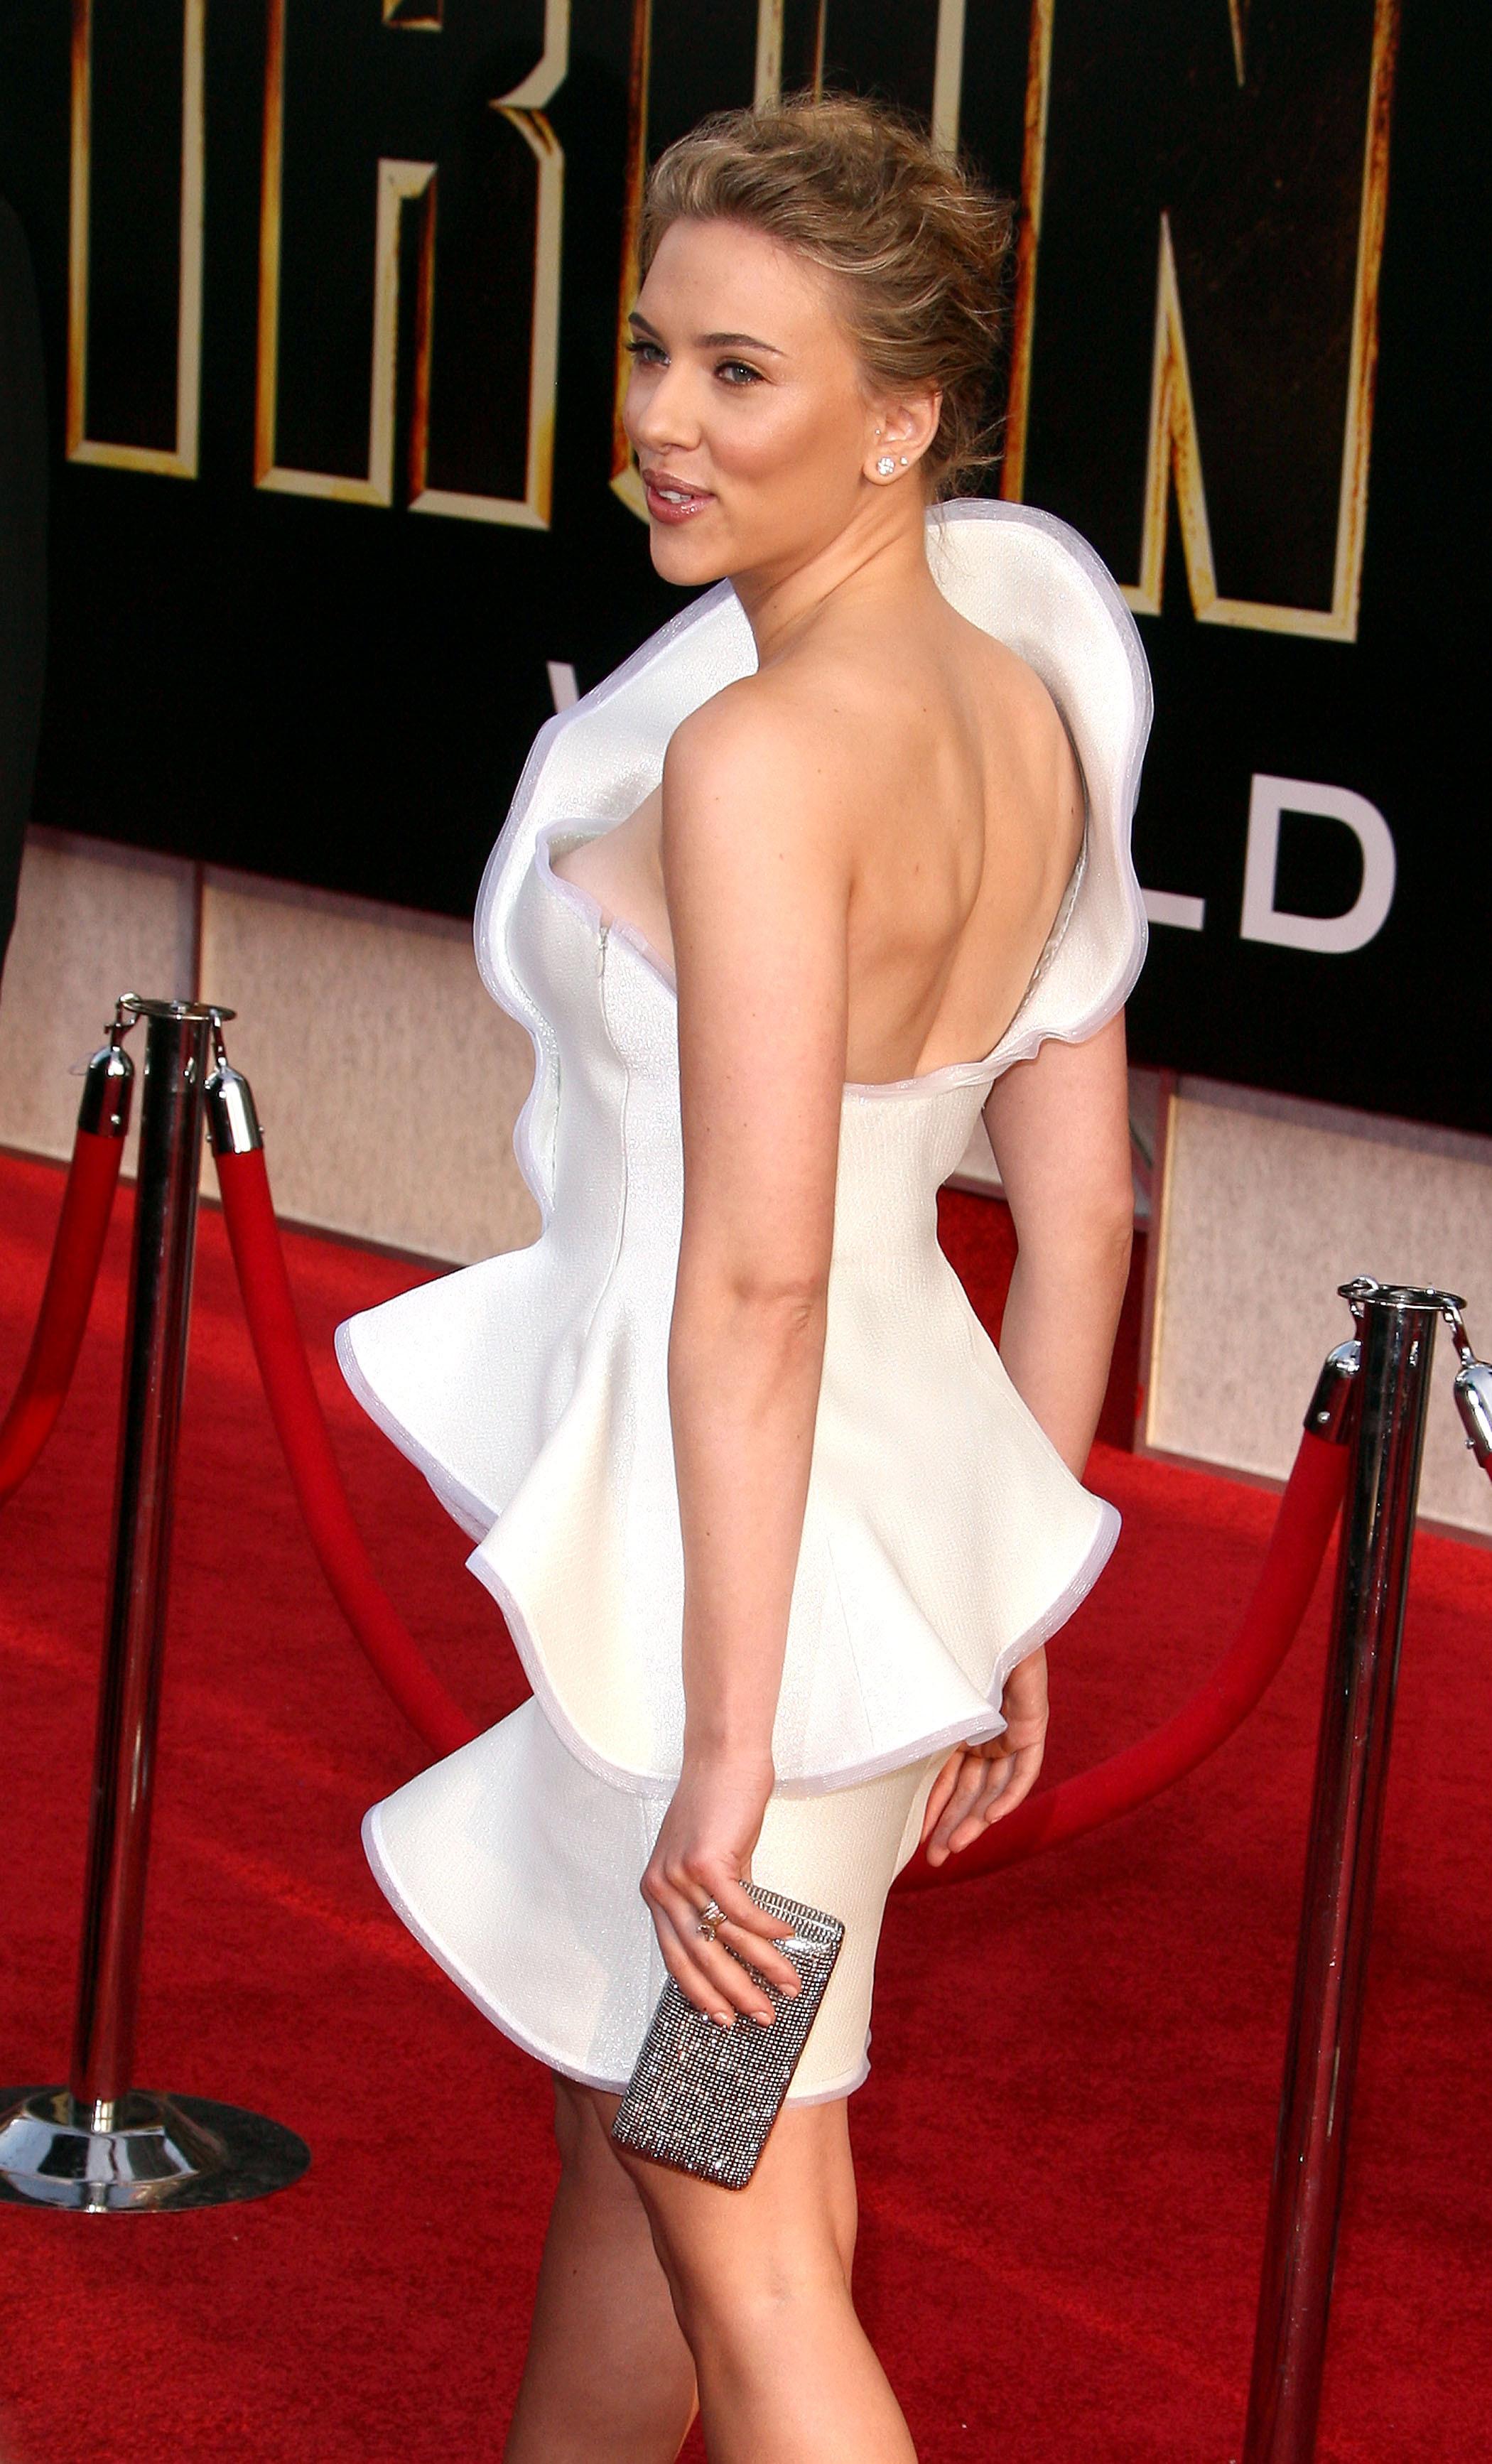 50741_celebrity_paradise.com_Scarlett_Johansson_Iron_Man_2_World_Premiere_in_Hollywood_26.04.2010_17_122_88lo.jpg